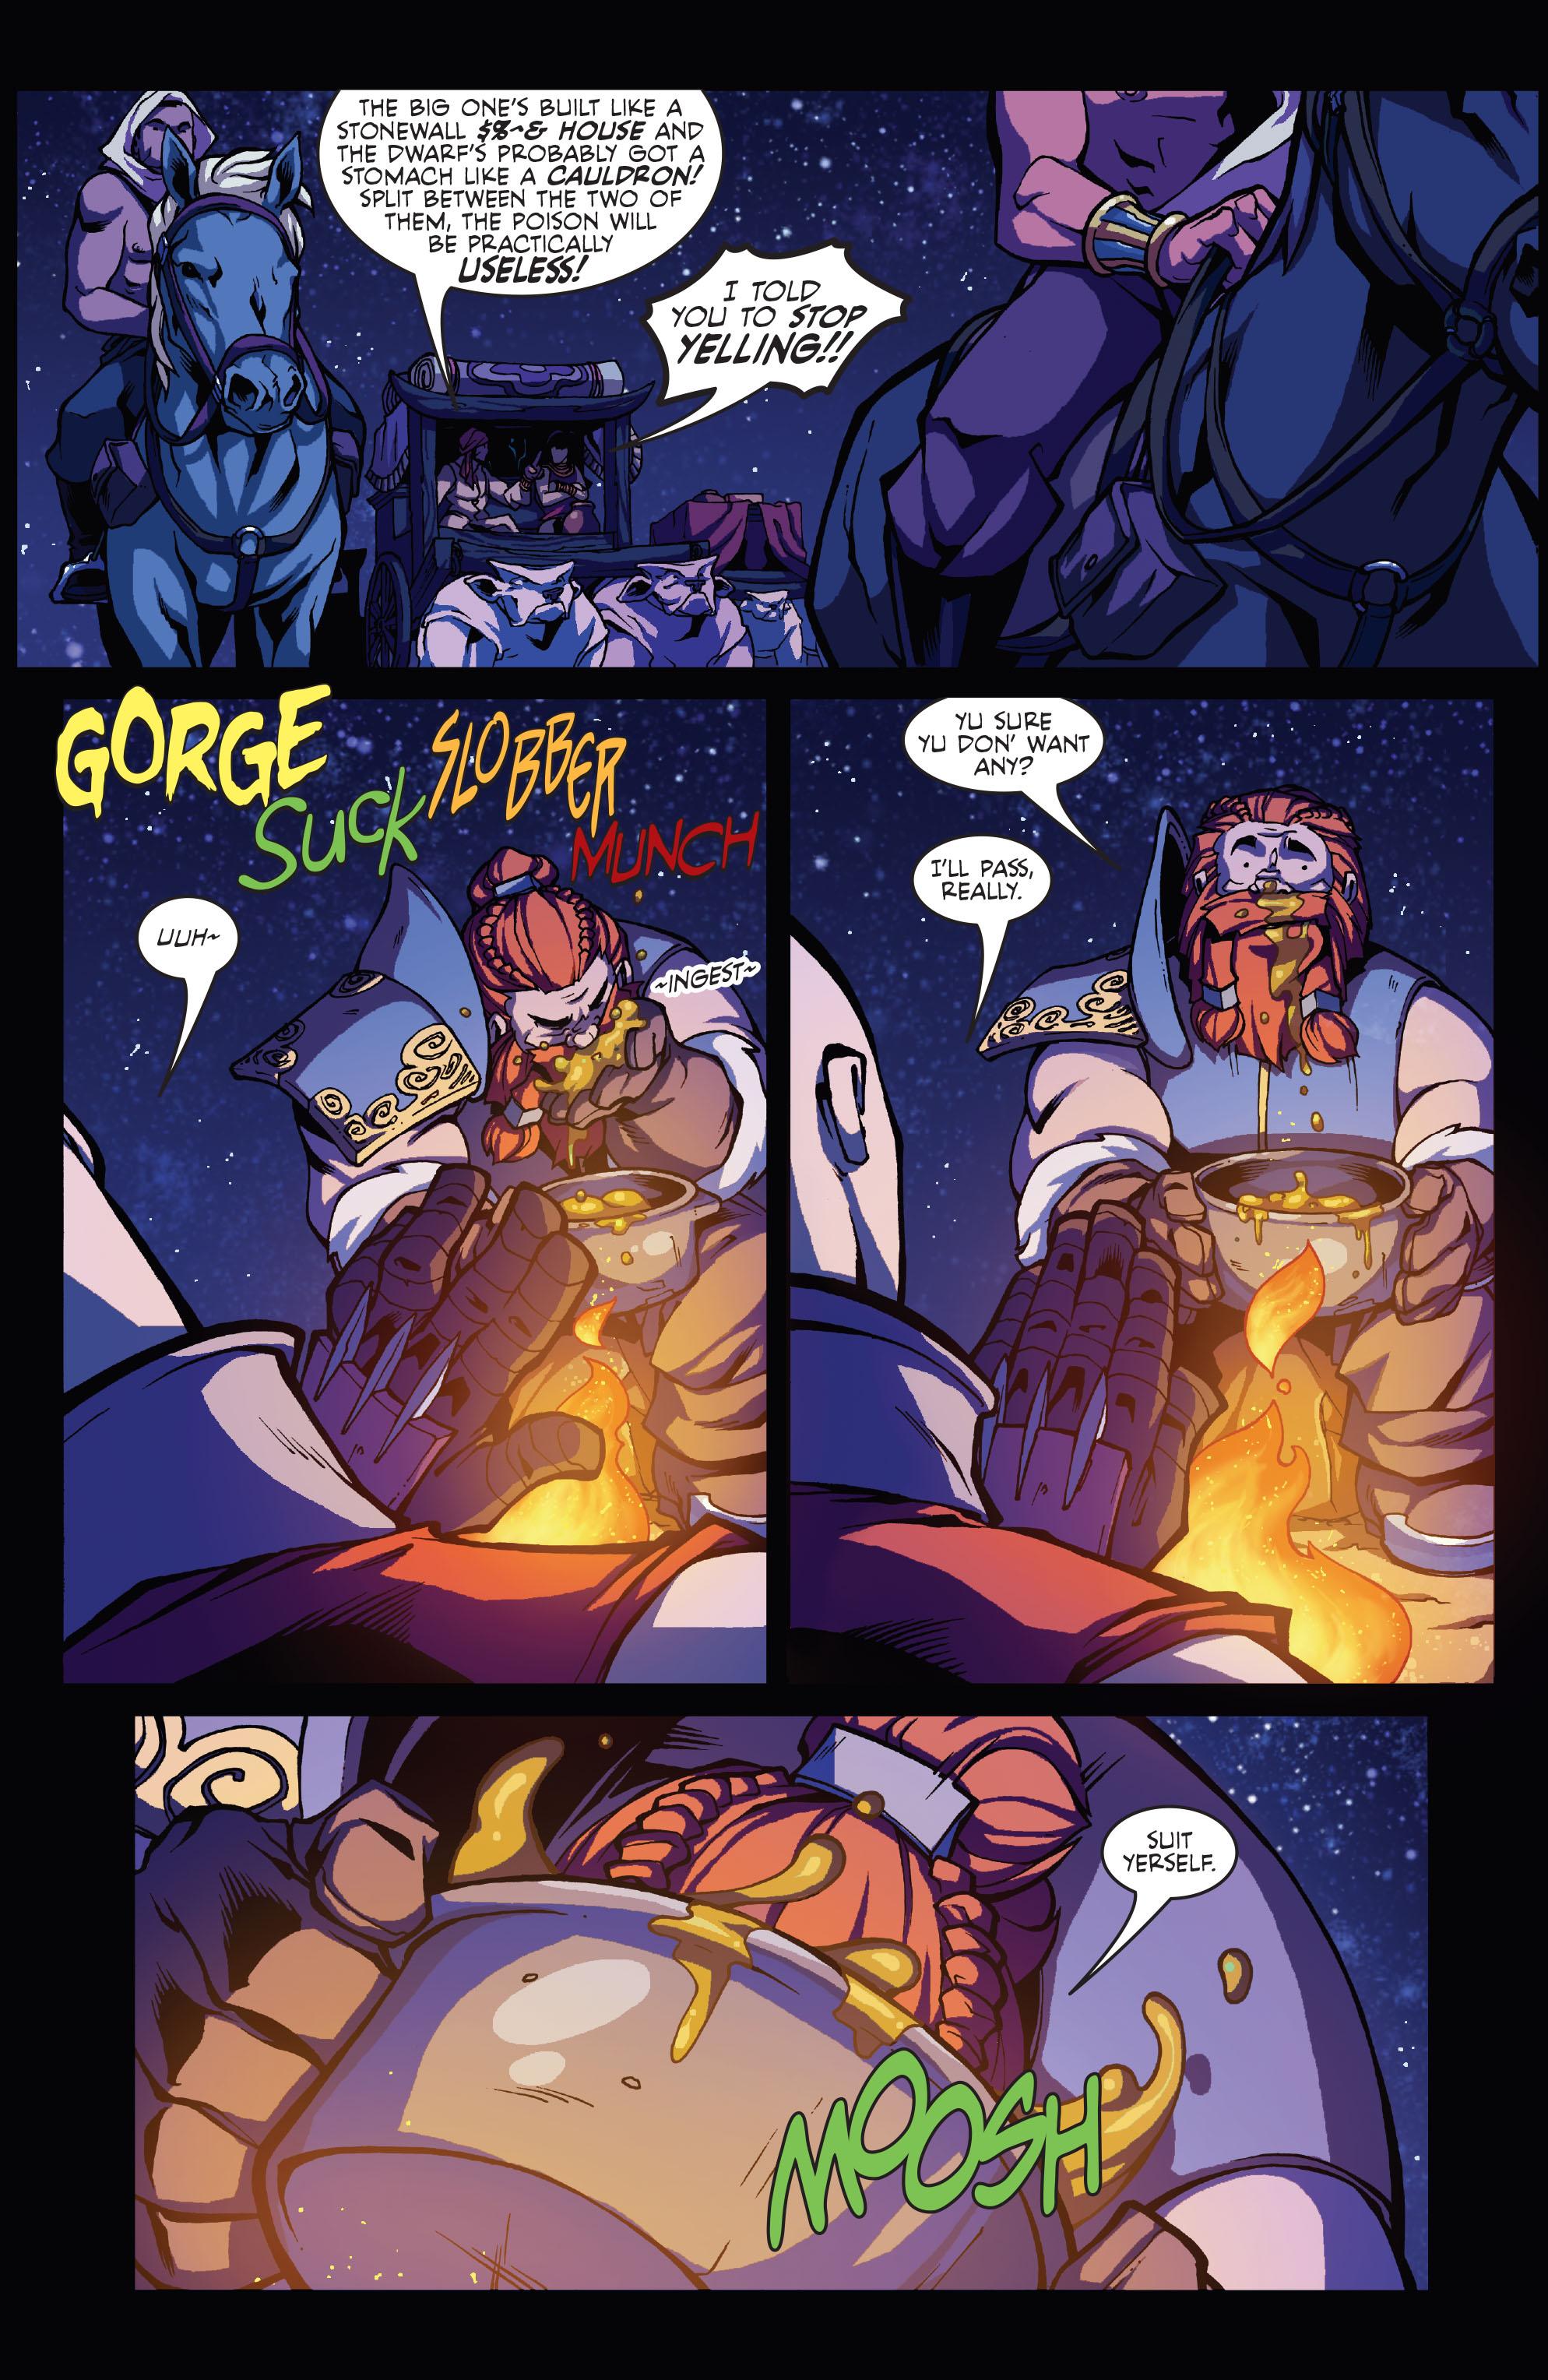 Read online Skullkickers comic -  Issue #3 - 5